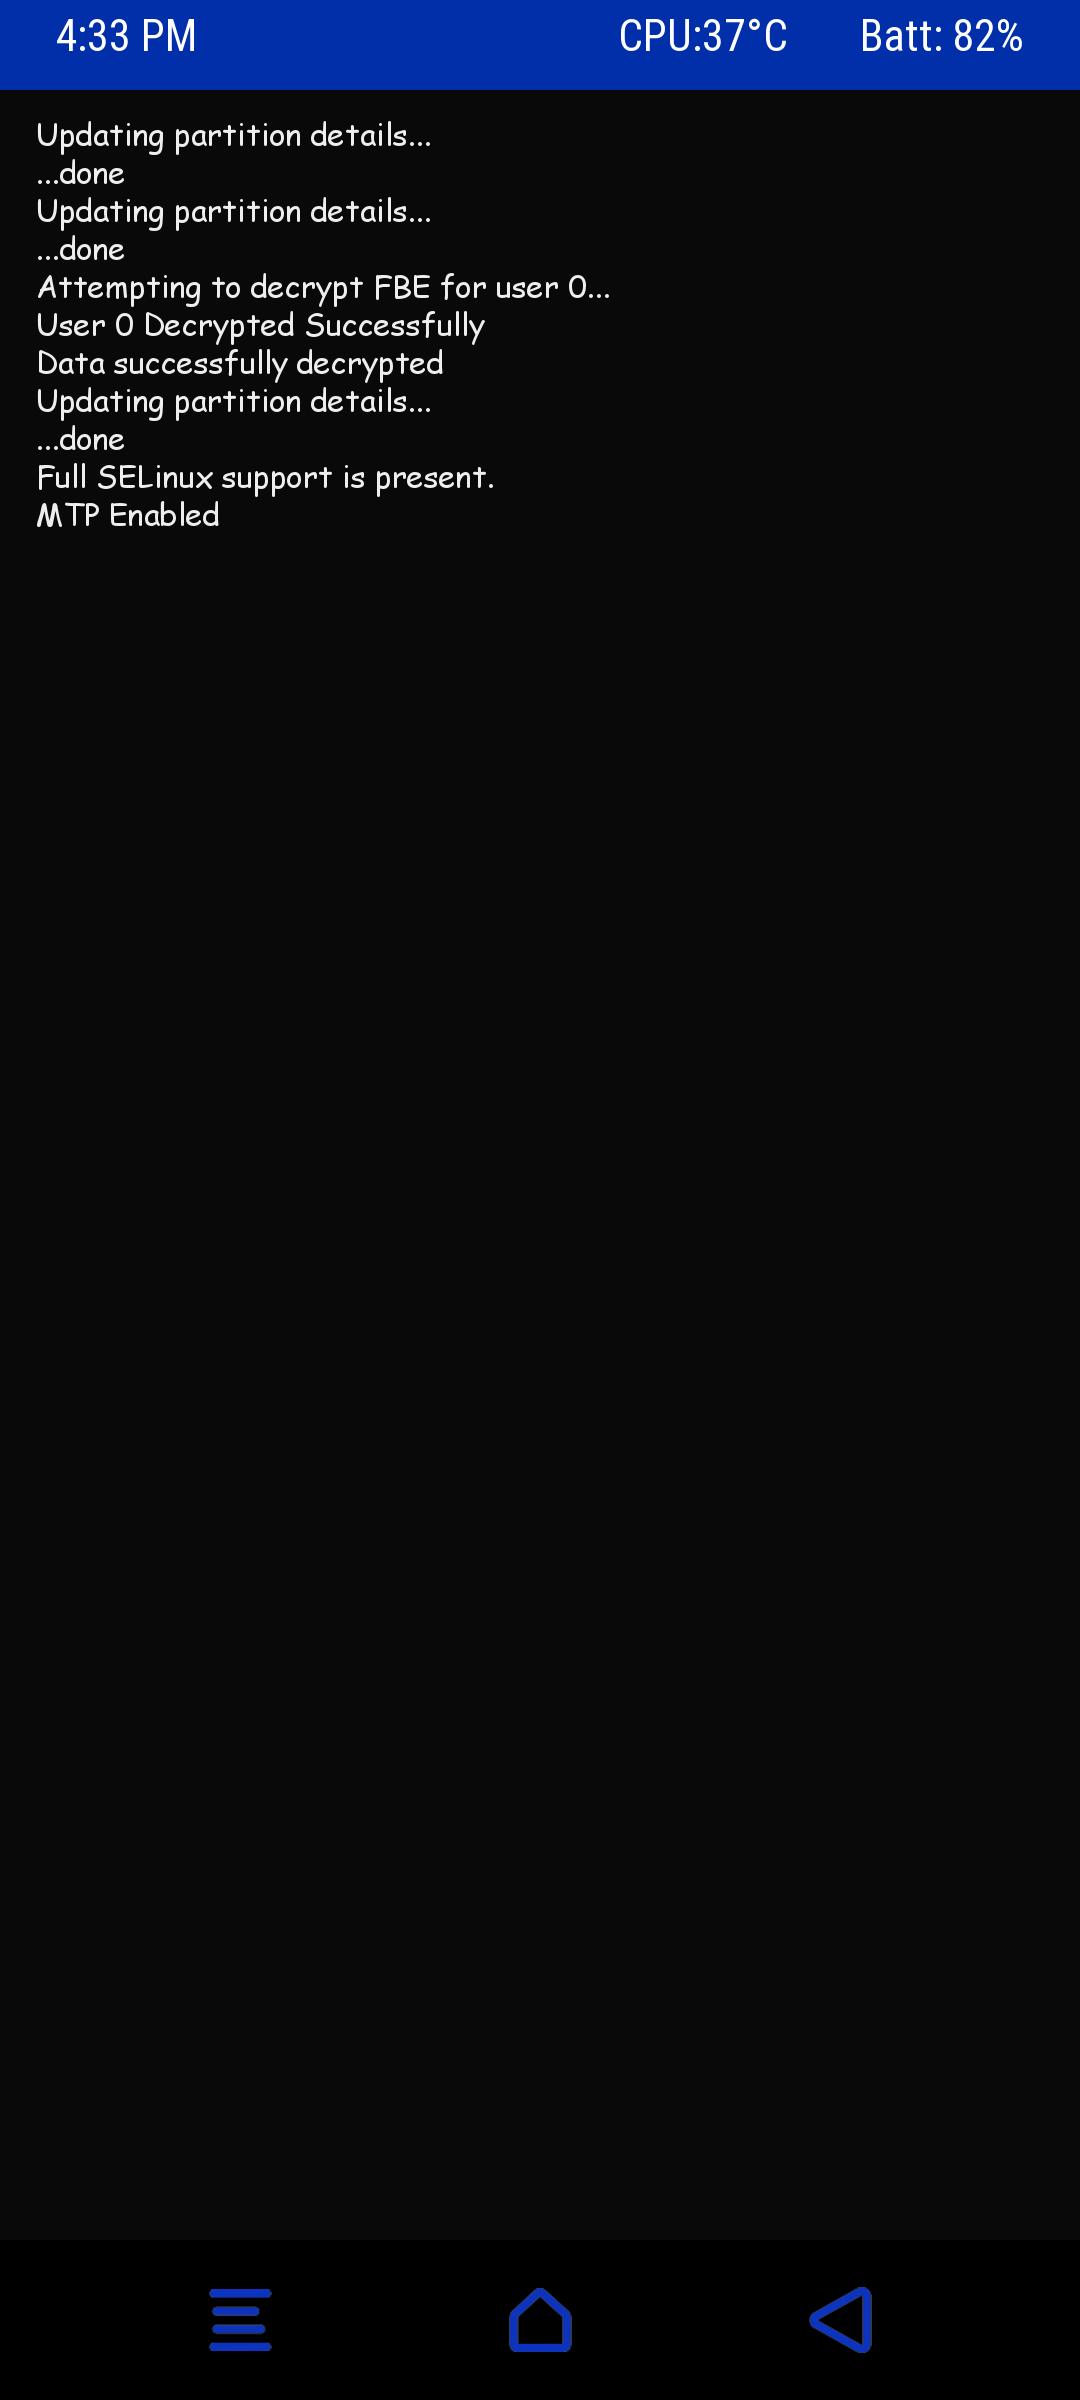 Screenshot_2021-01-18-16-33-55.png